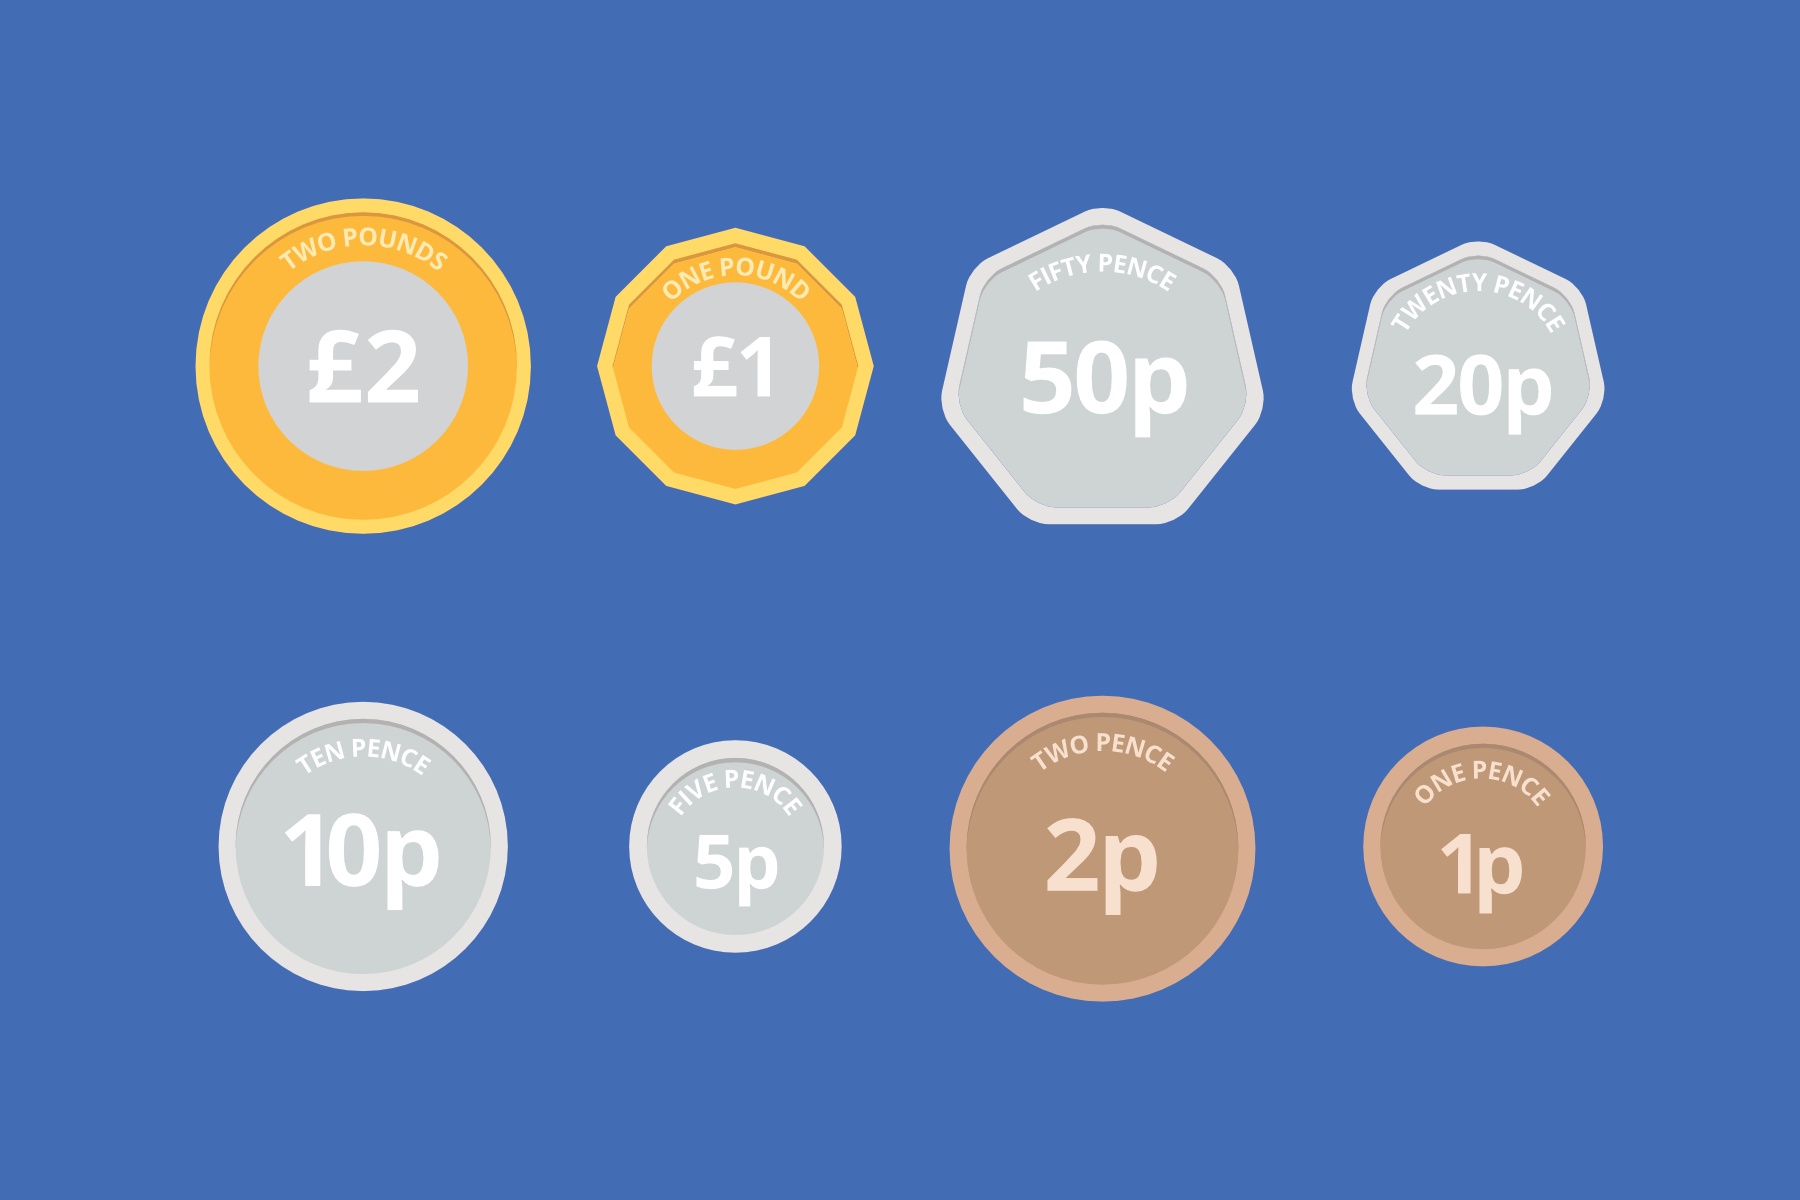 photograph regarding Coins Printable titled United kingdom Cash - PAPERZIP